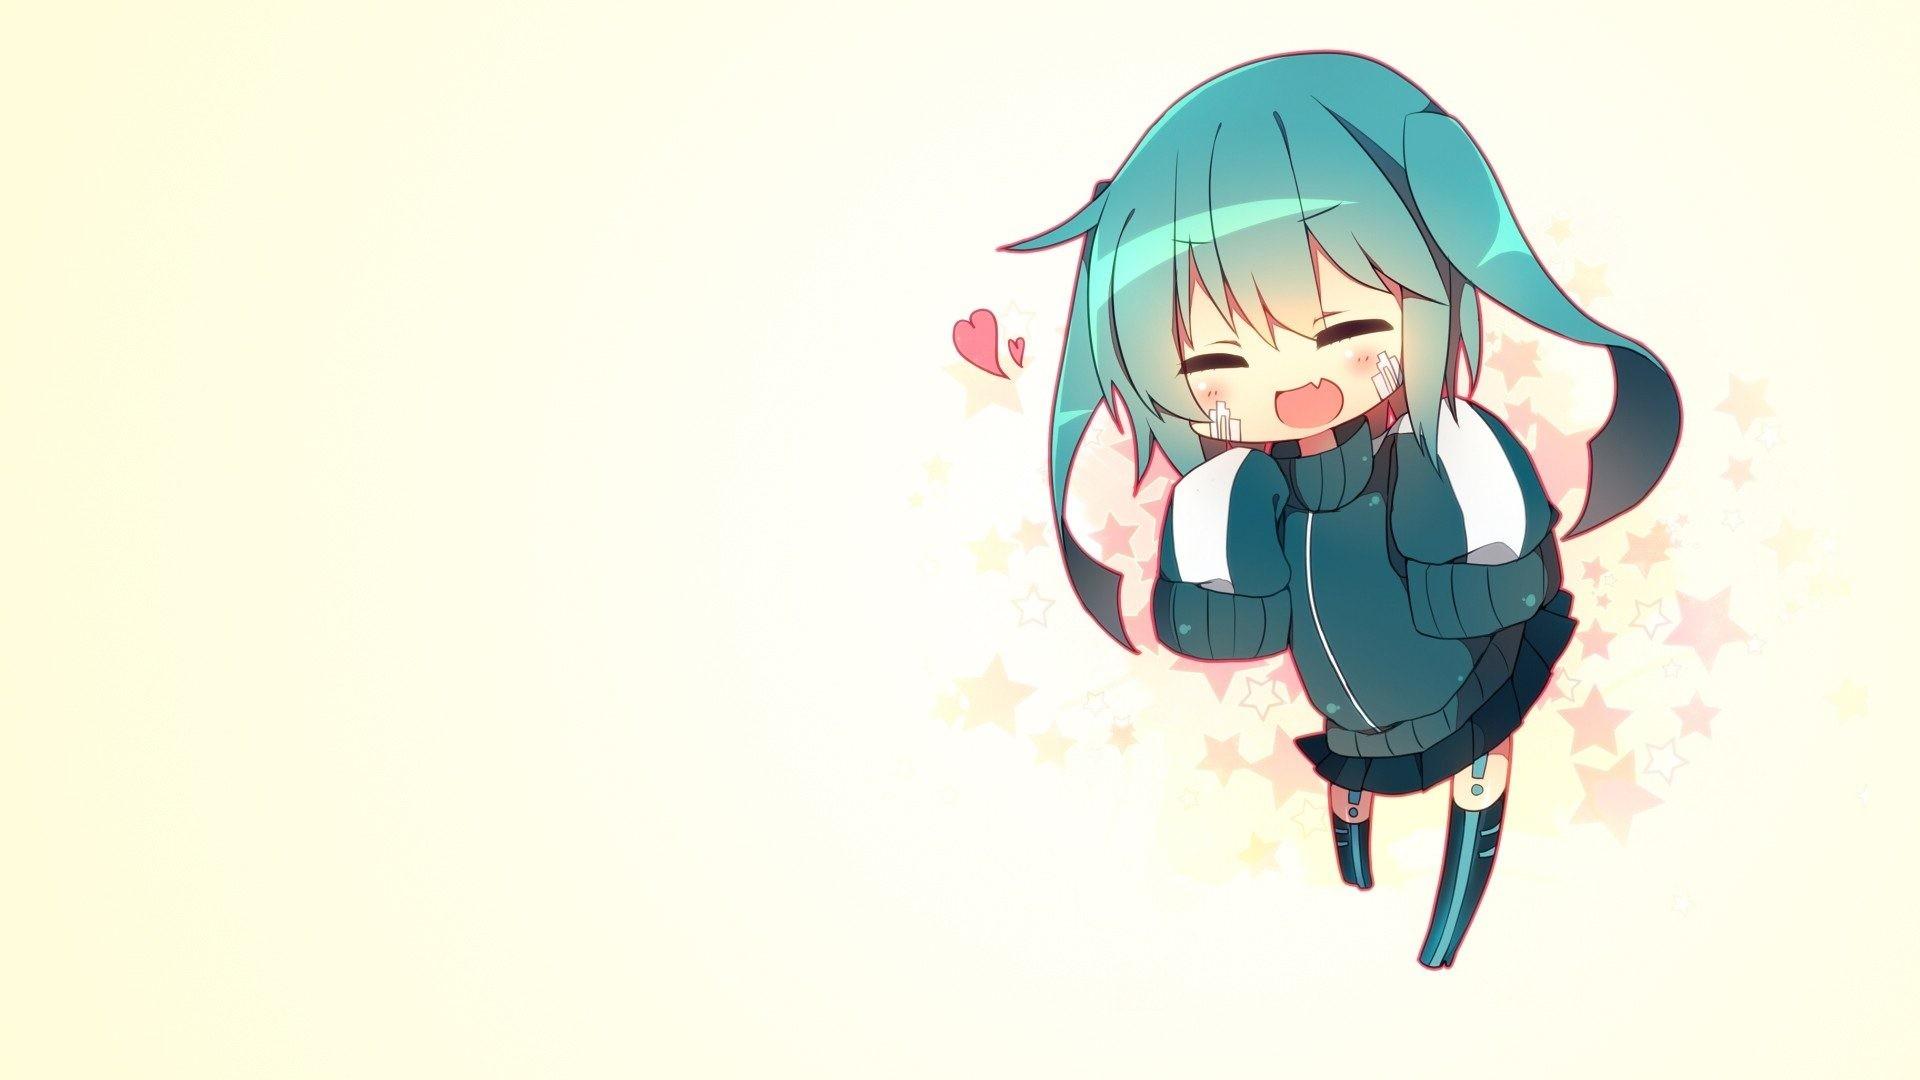 Res: 1920x1080, Download Girls Images 4k Background HD Wallpaper hatsune miku girl green  hair toon 88117